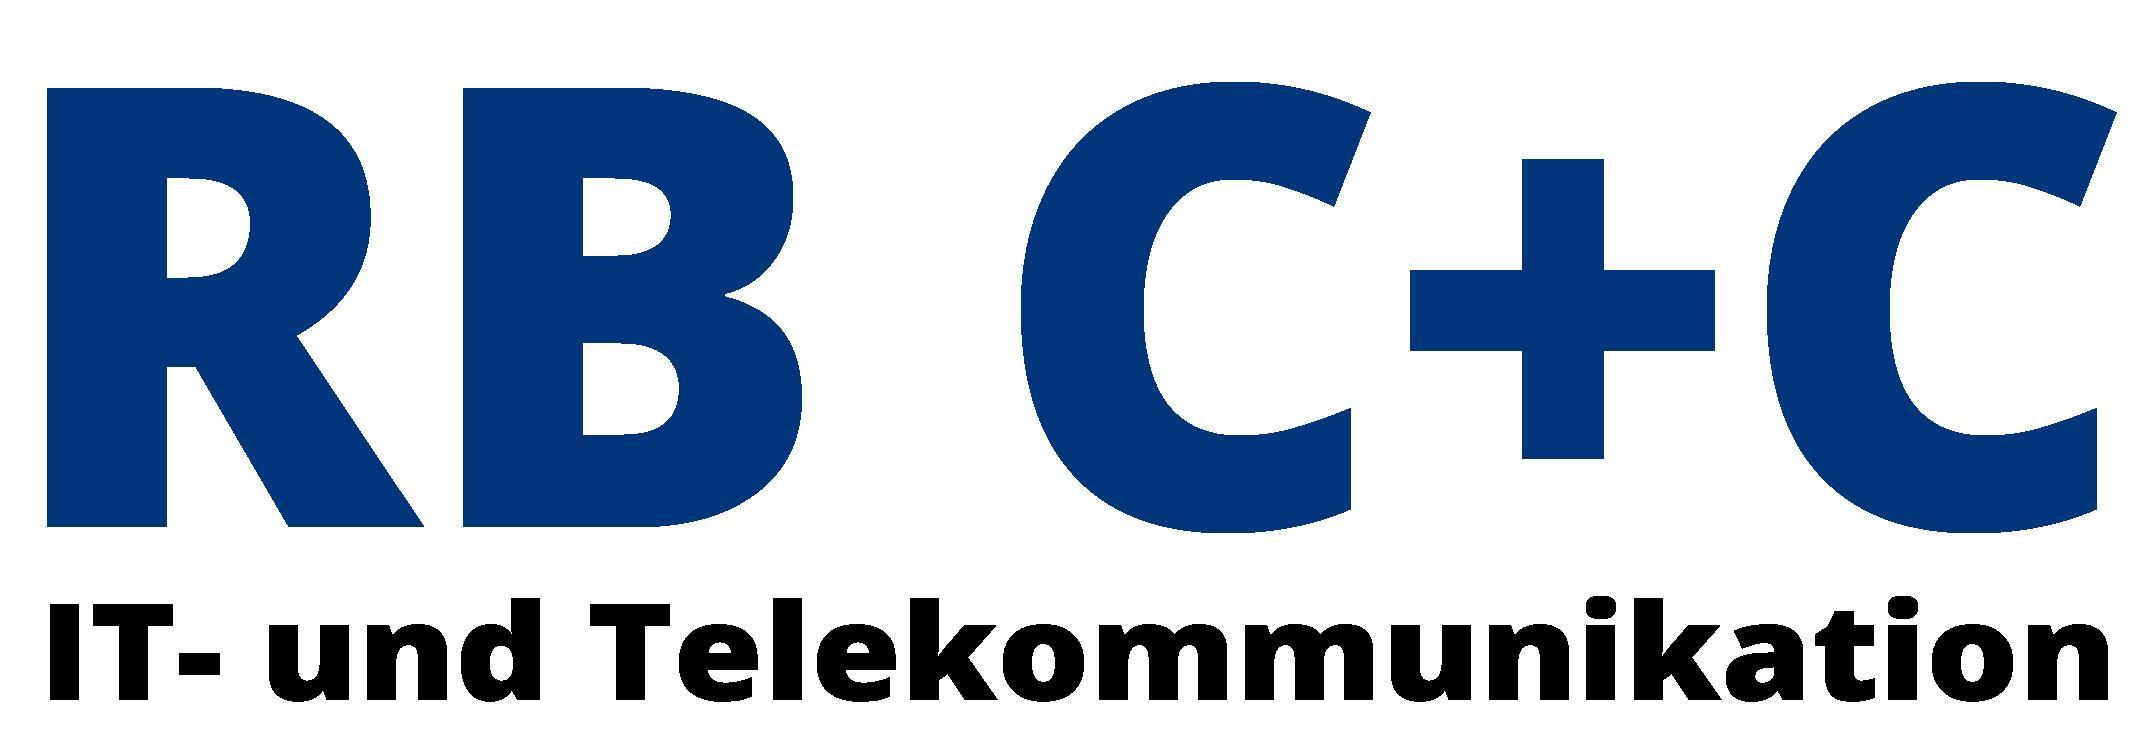 Ralf Bender RB C+C